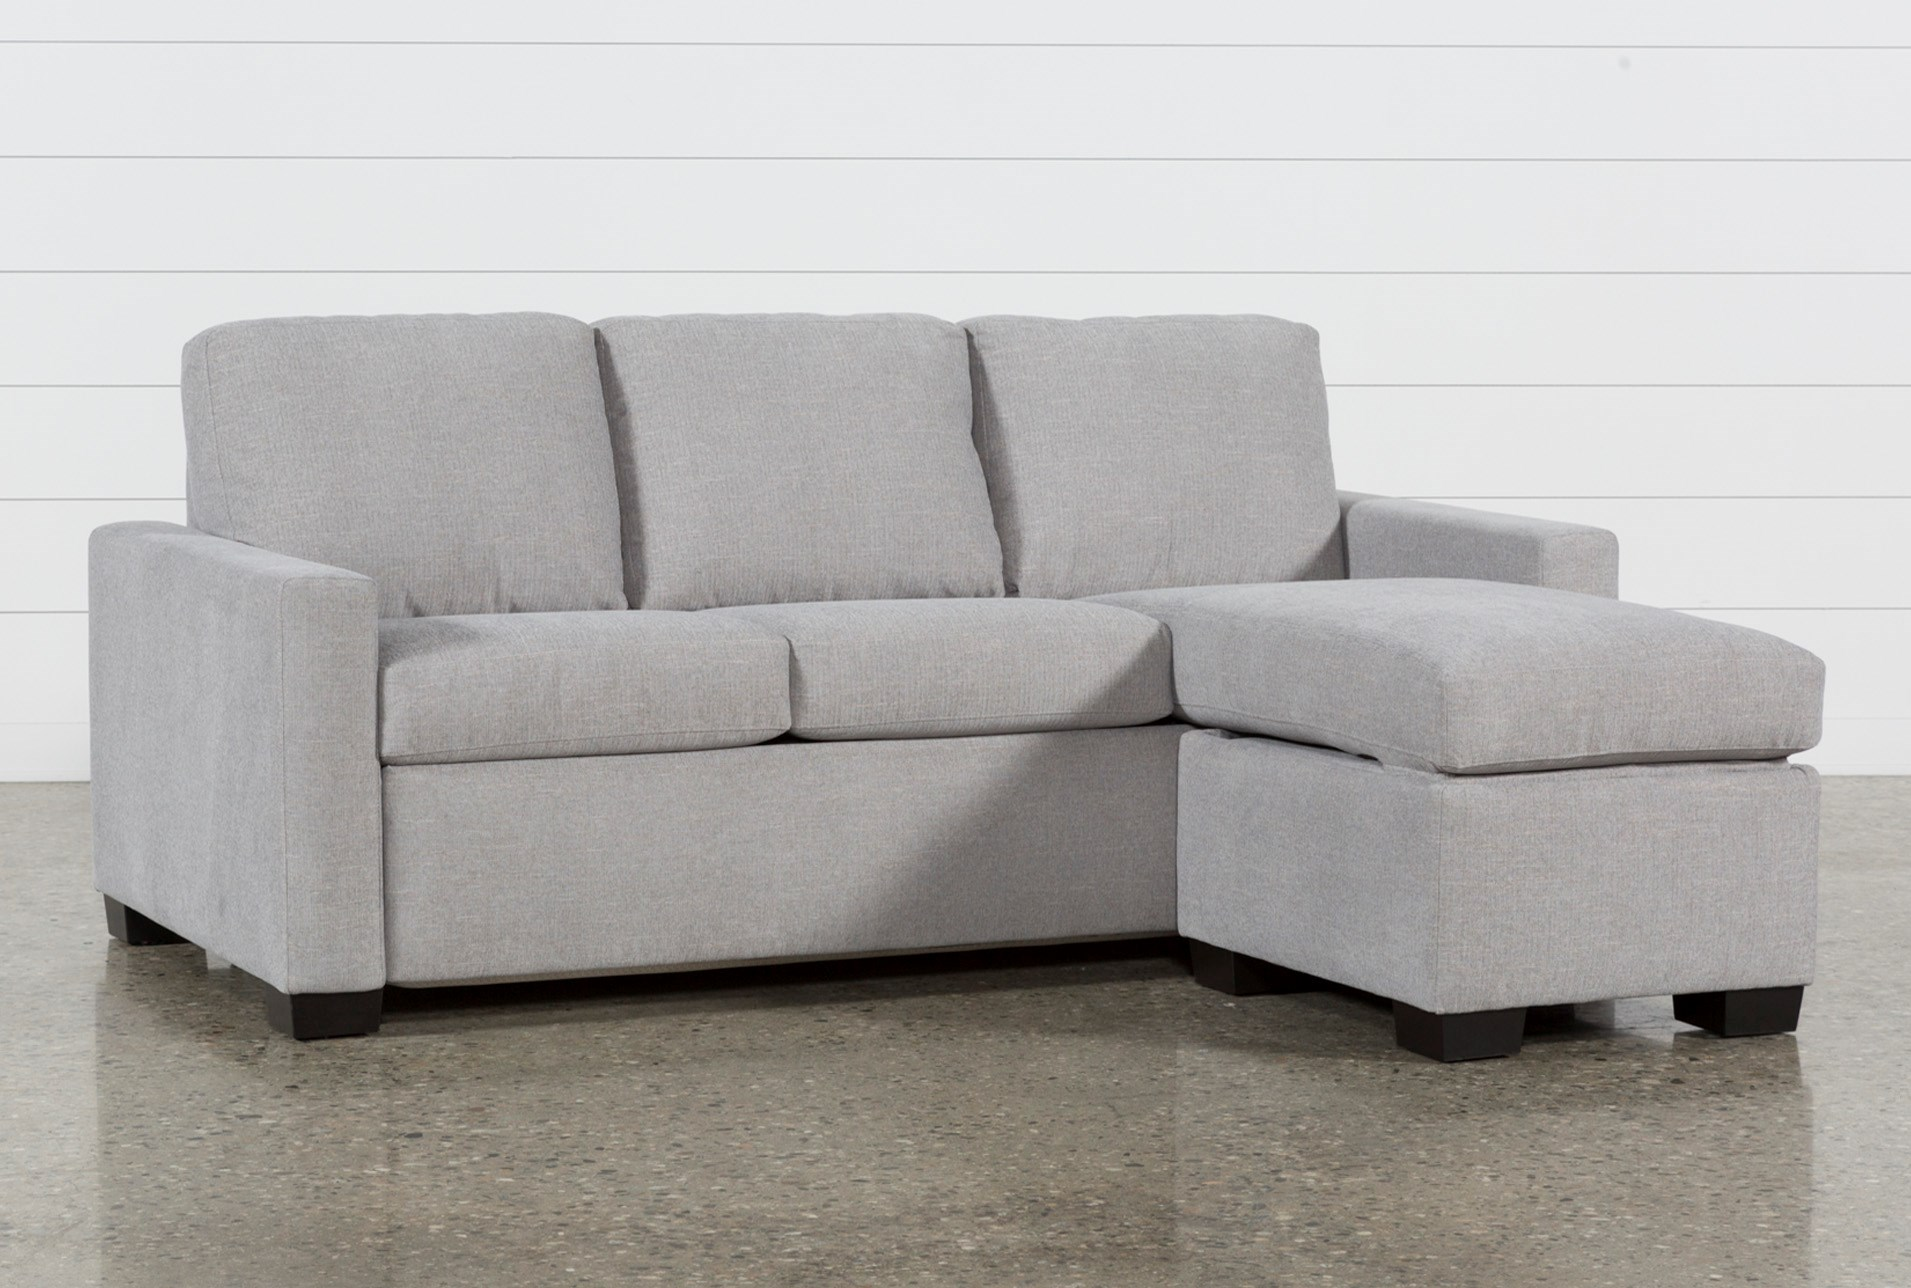 queen sofa bed. Fine Bed Mackenzie Silverpine Queen Plus Sofa Sleeper W Storage Chaise Inside Bed